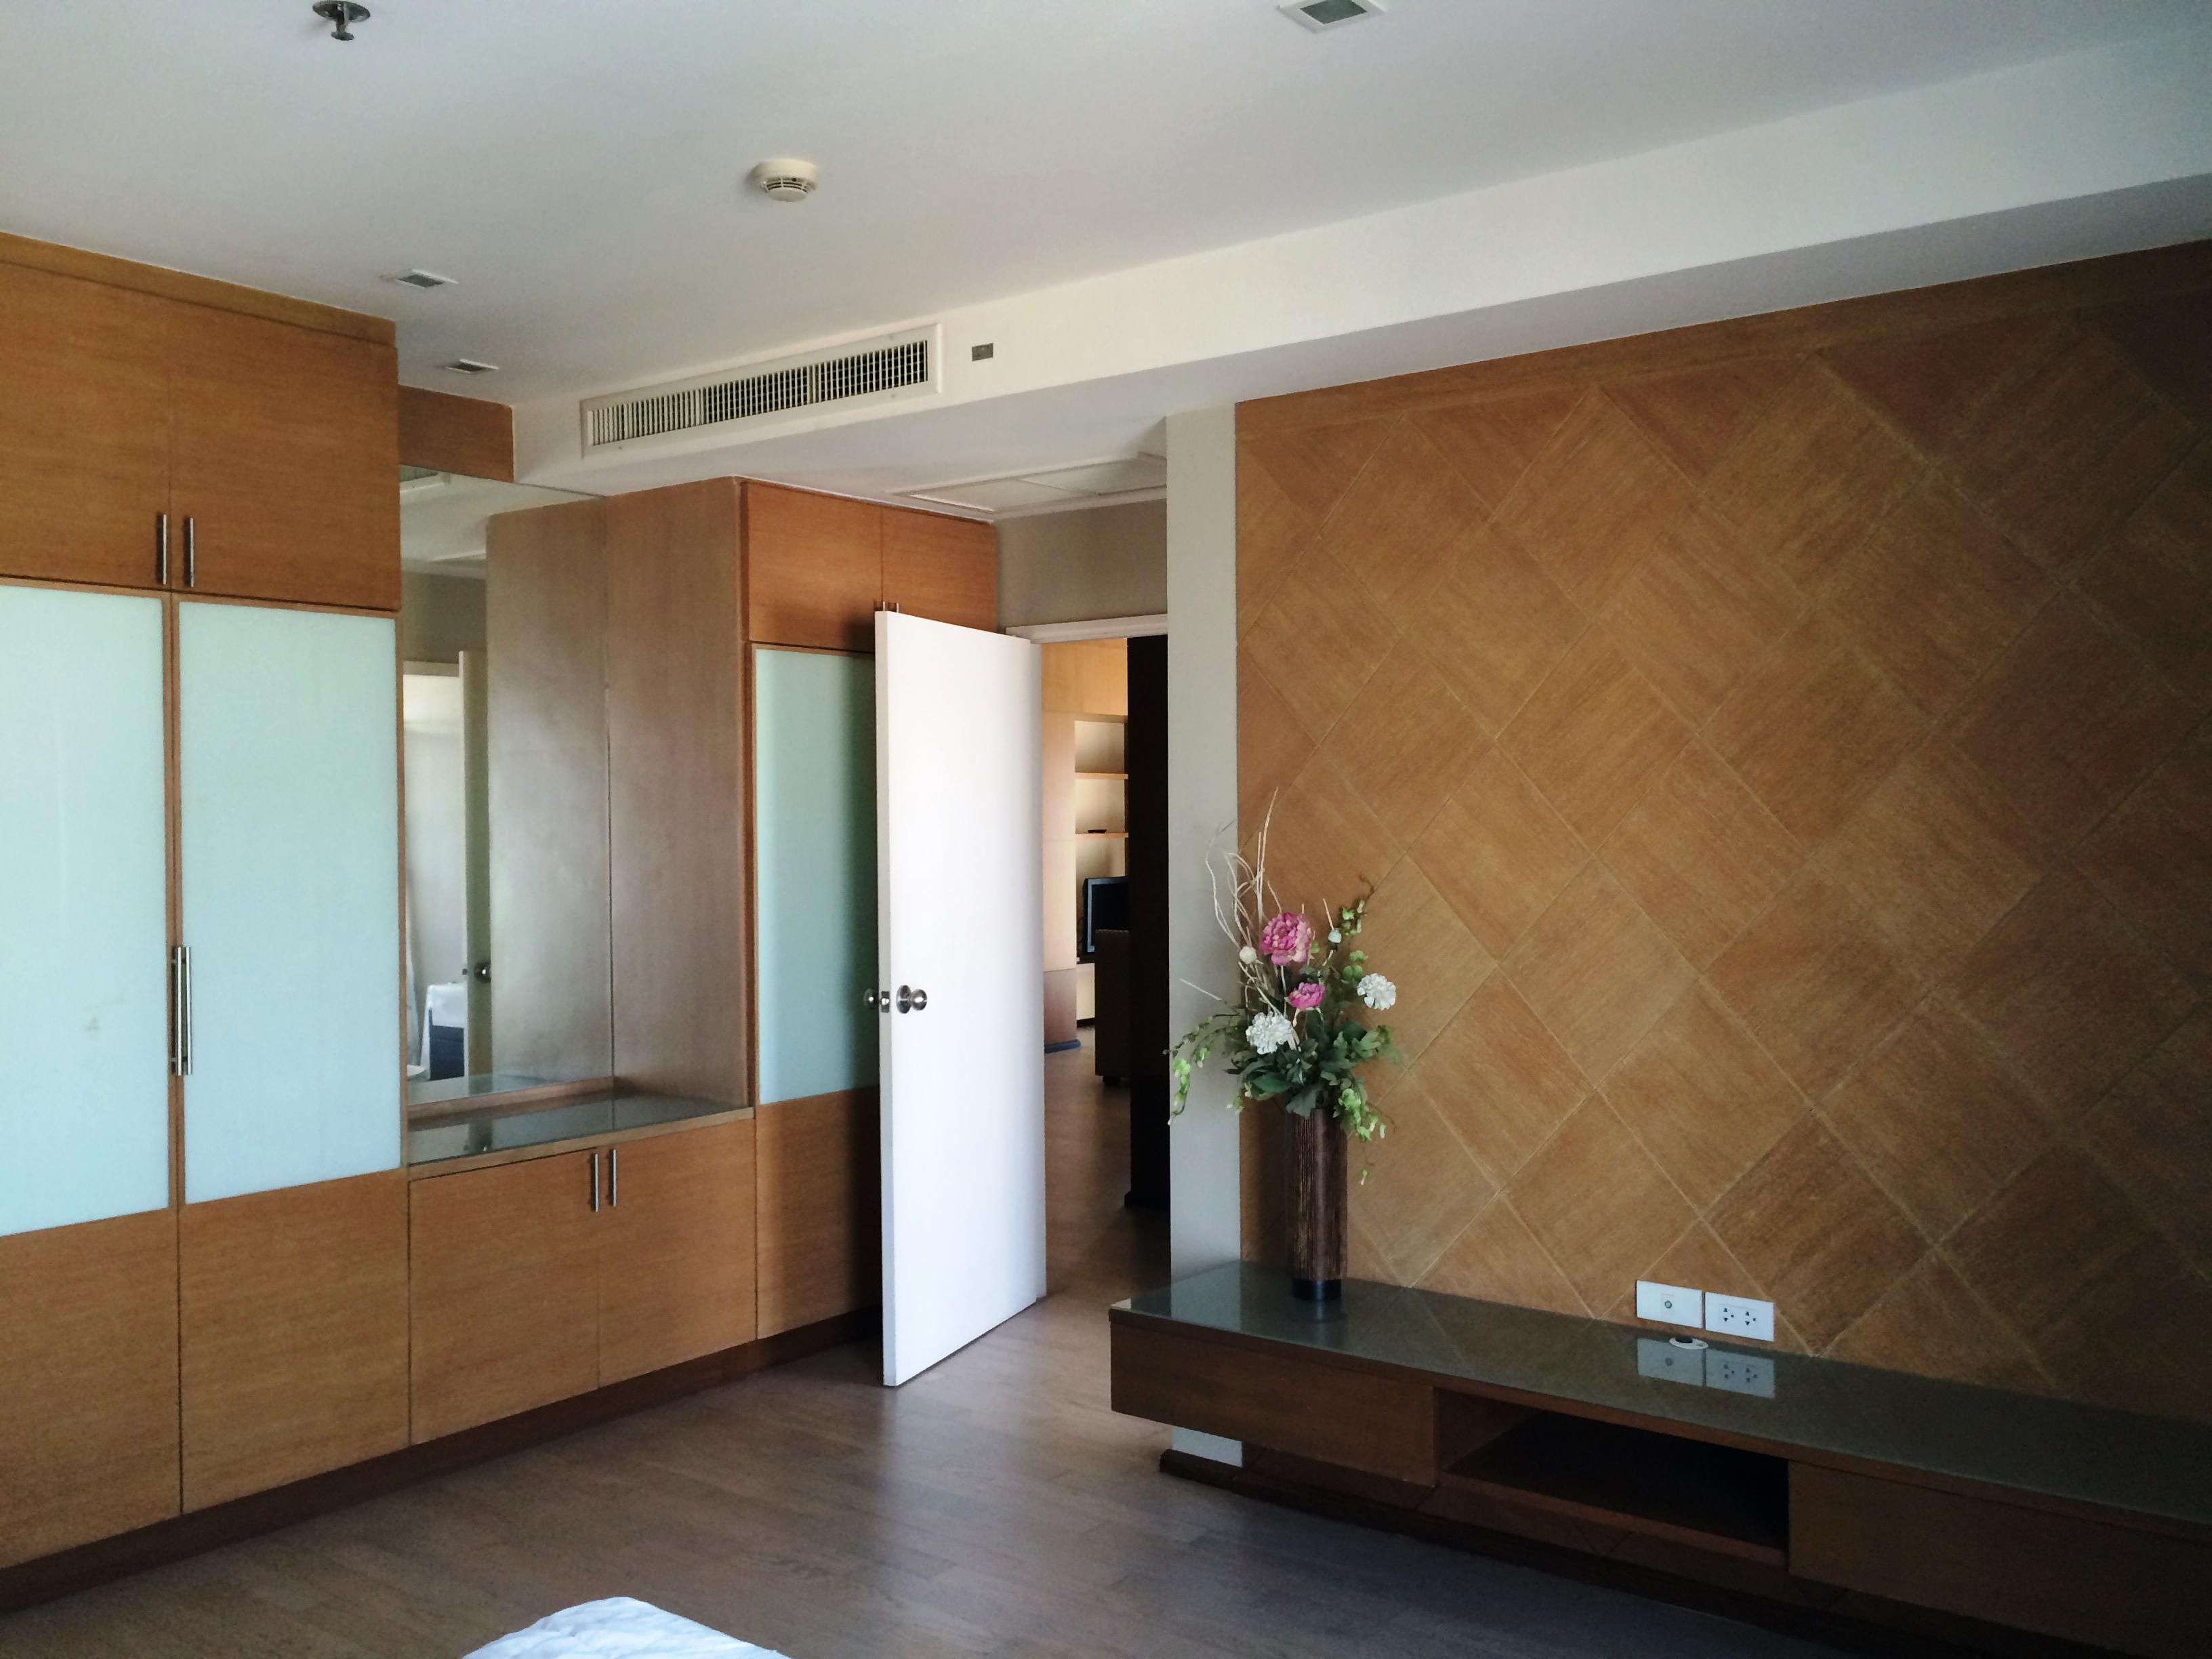 RE/MAX Properties Agency's Noble Remix, 2B/2B, High floor, BTS Thong Lo - sky walk access 2